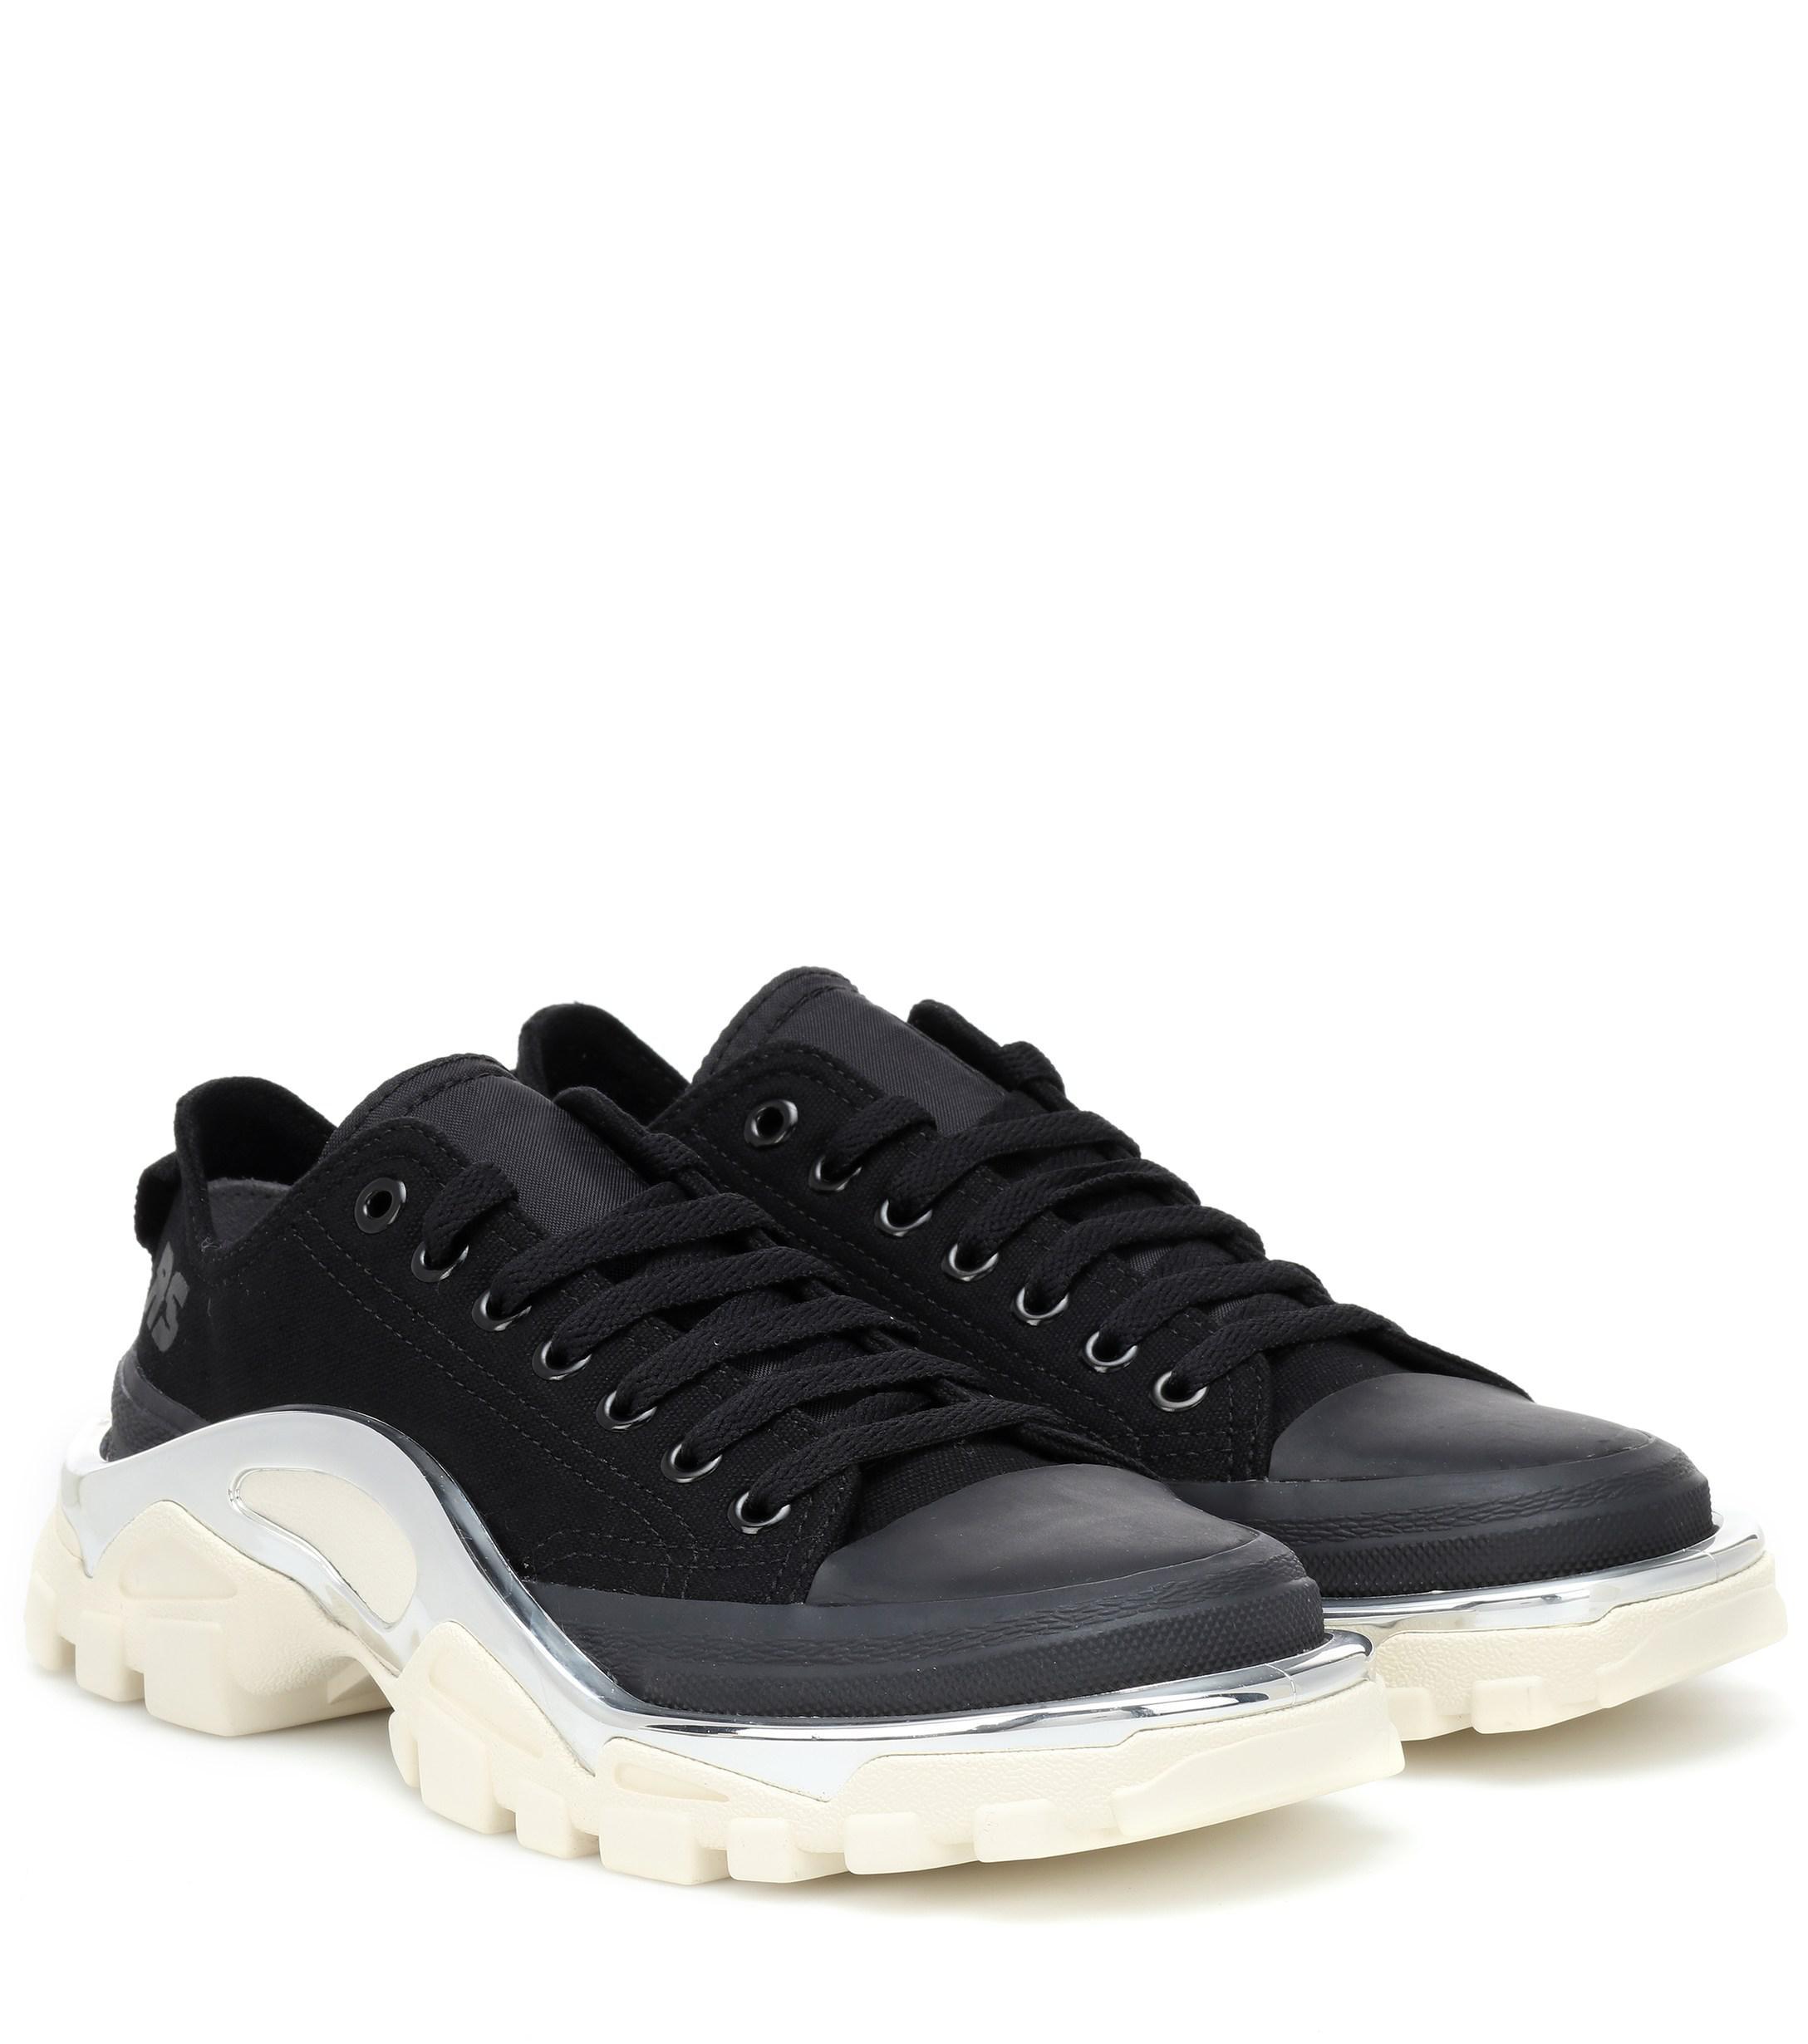 Lyst - adidas By Raf Simons Rs Detroit Runner Sneakers in Black 44d6ecb0e